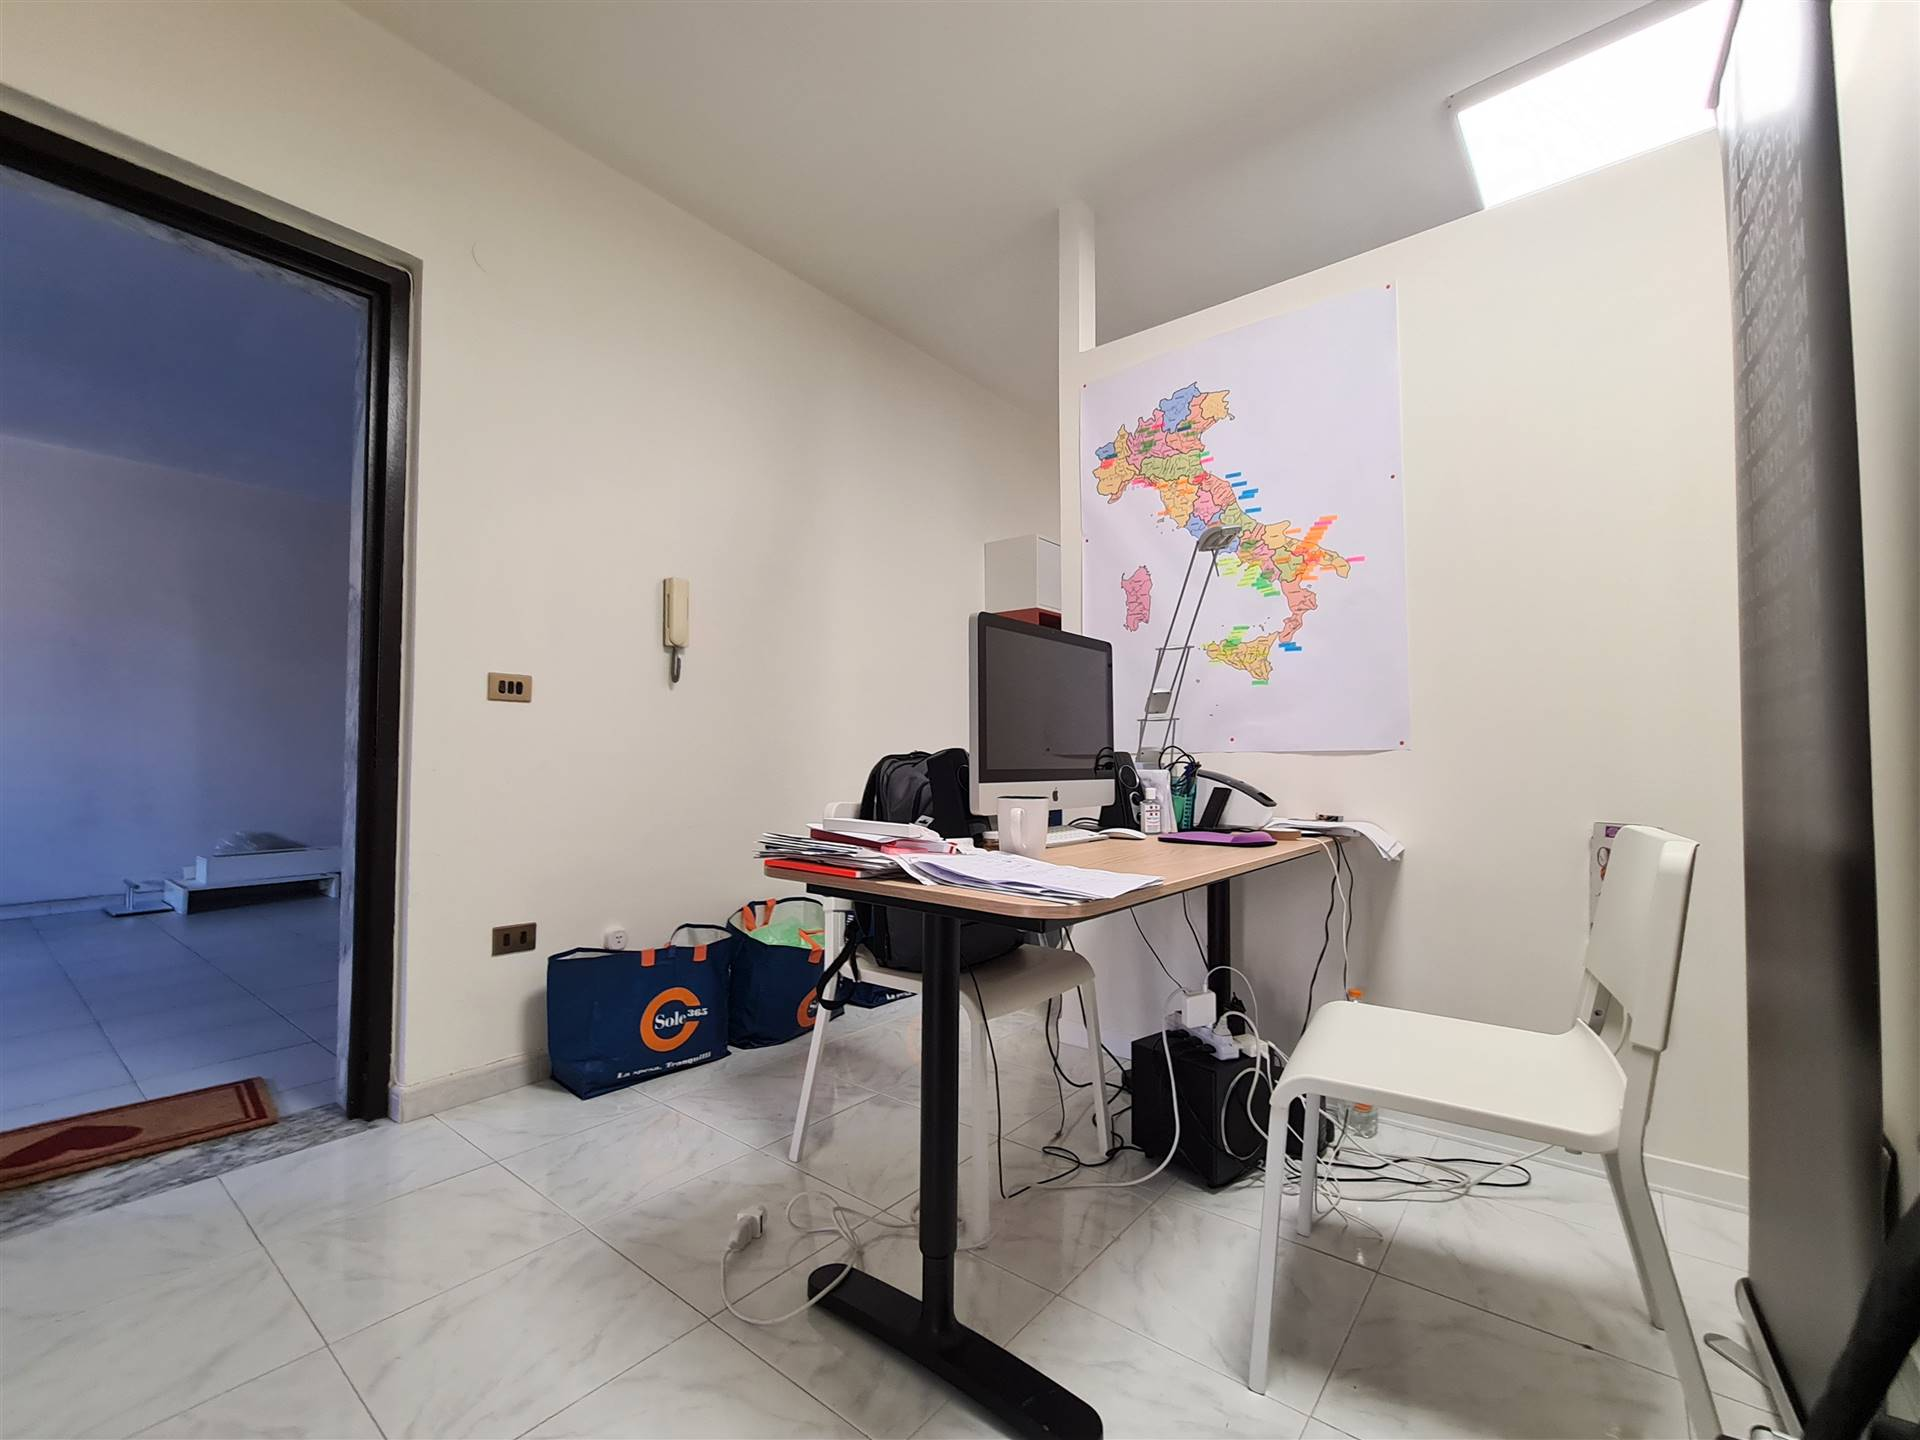 UV01D-Ufficio-SANTA-MARIA-CAPUA-VETERE--